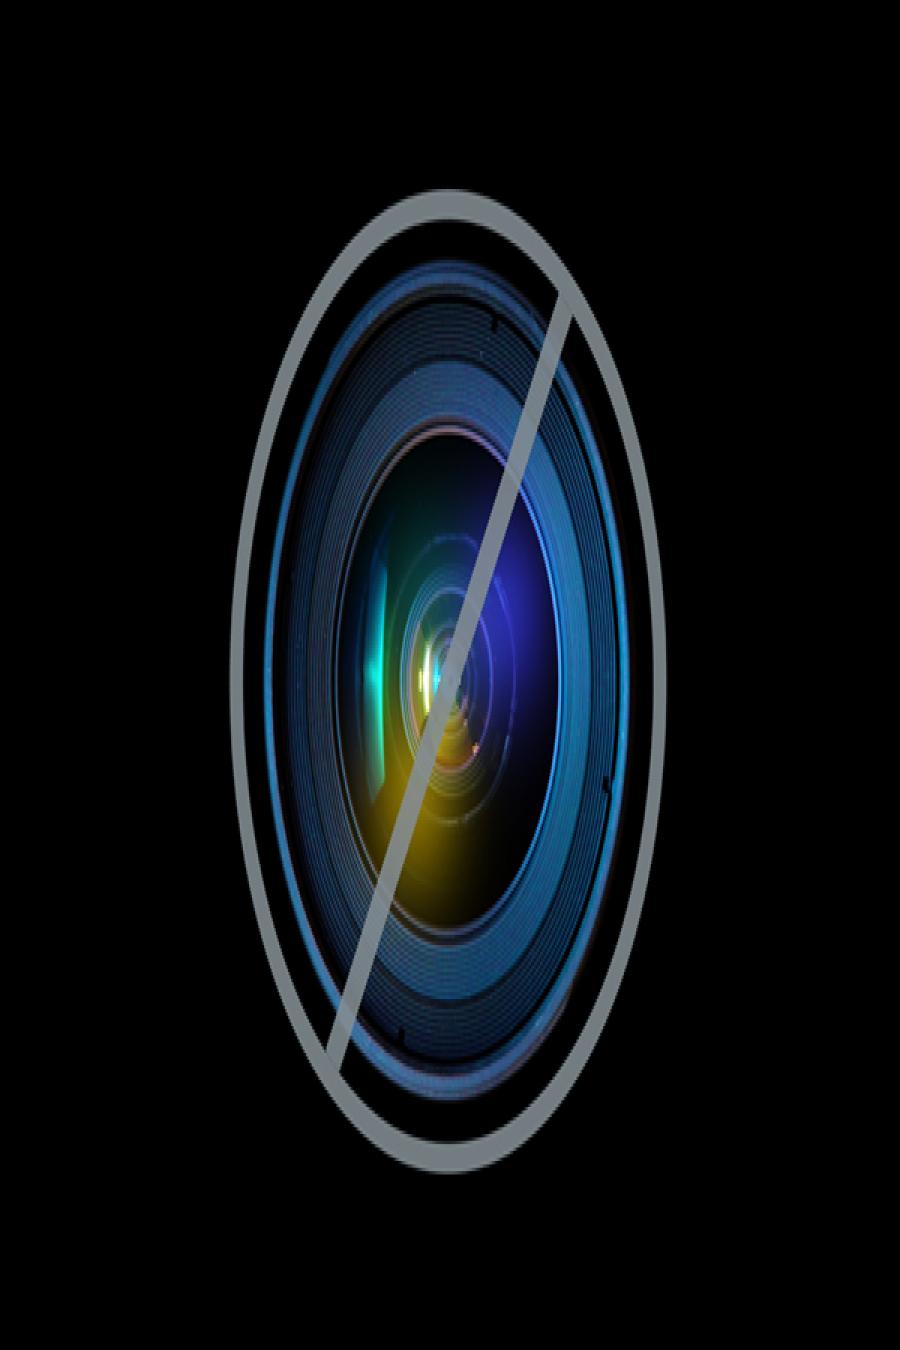 iphone photo awards